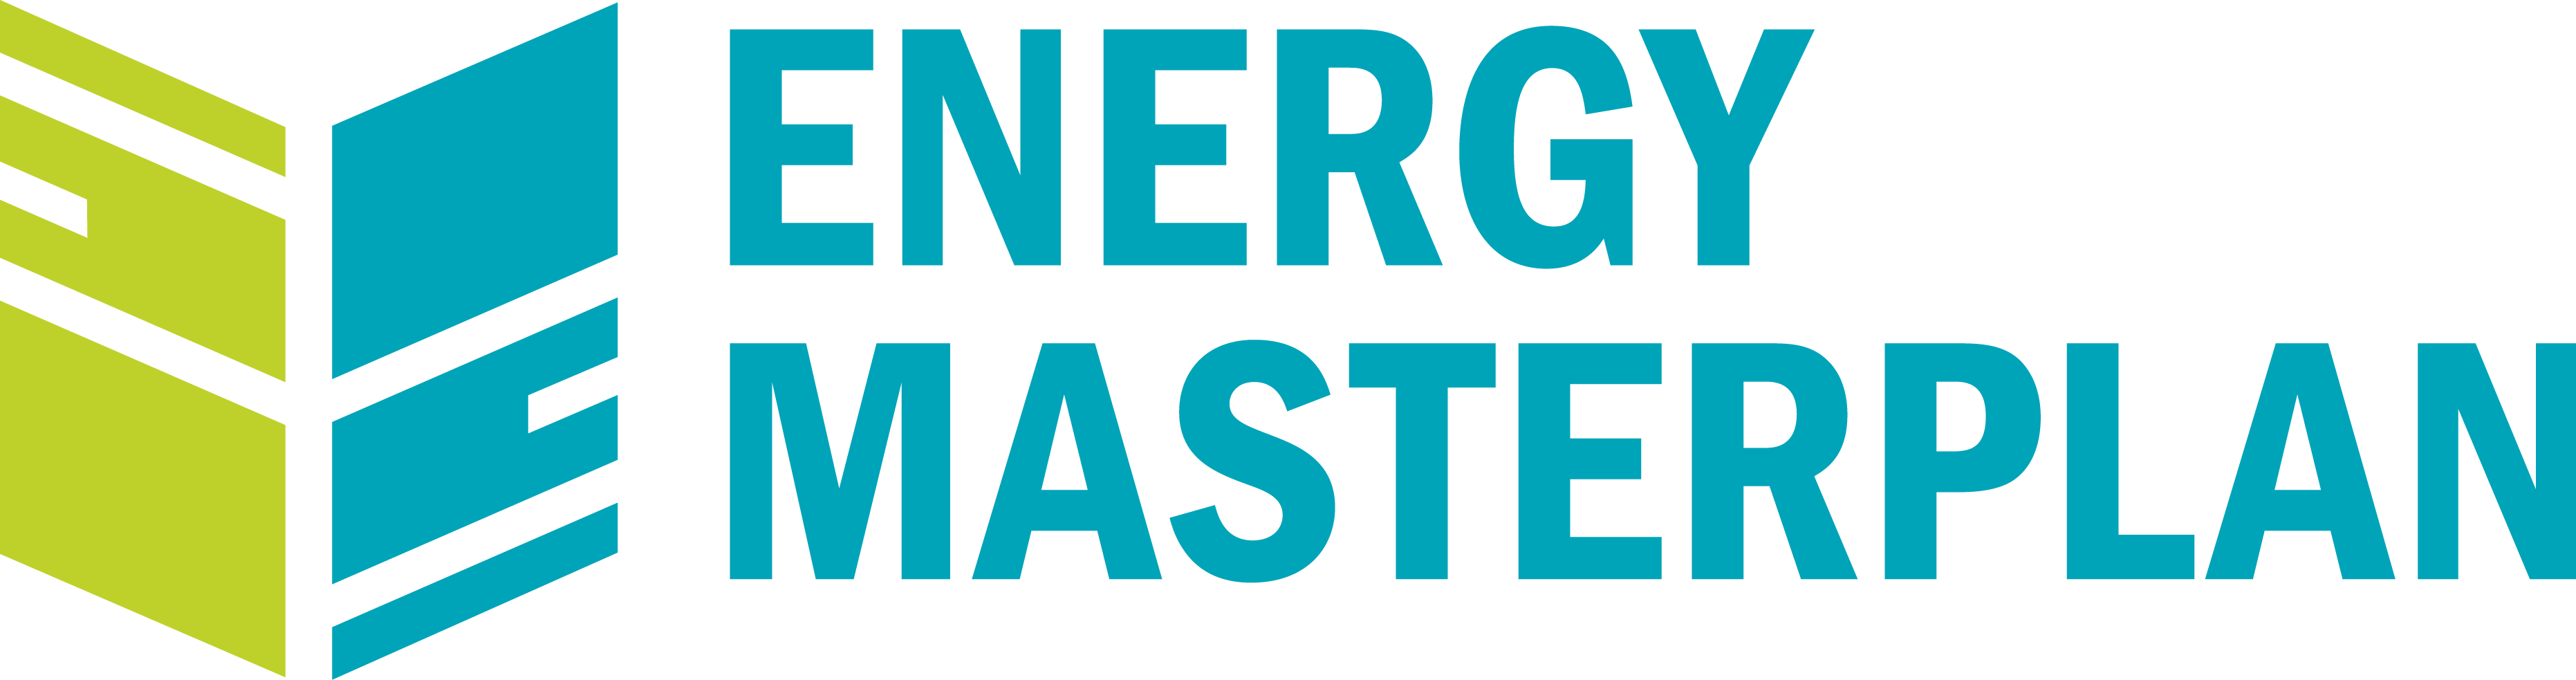 Energy Masterplan logo